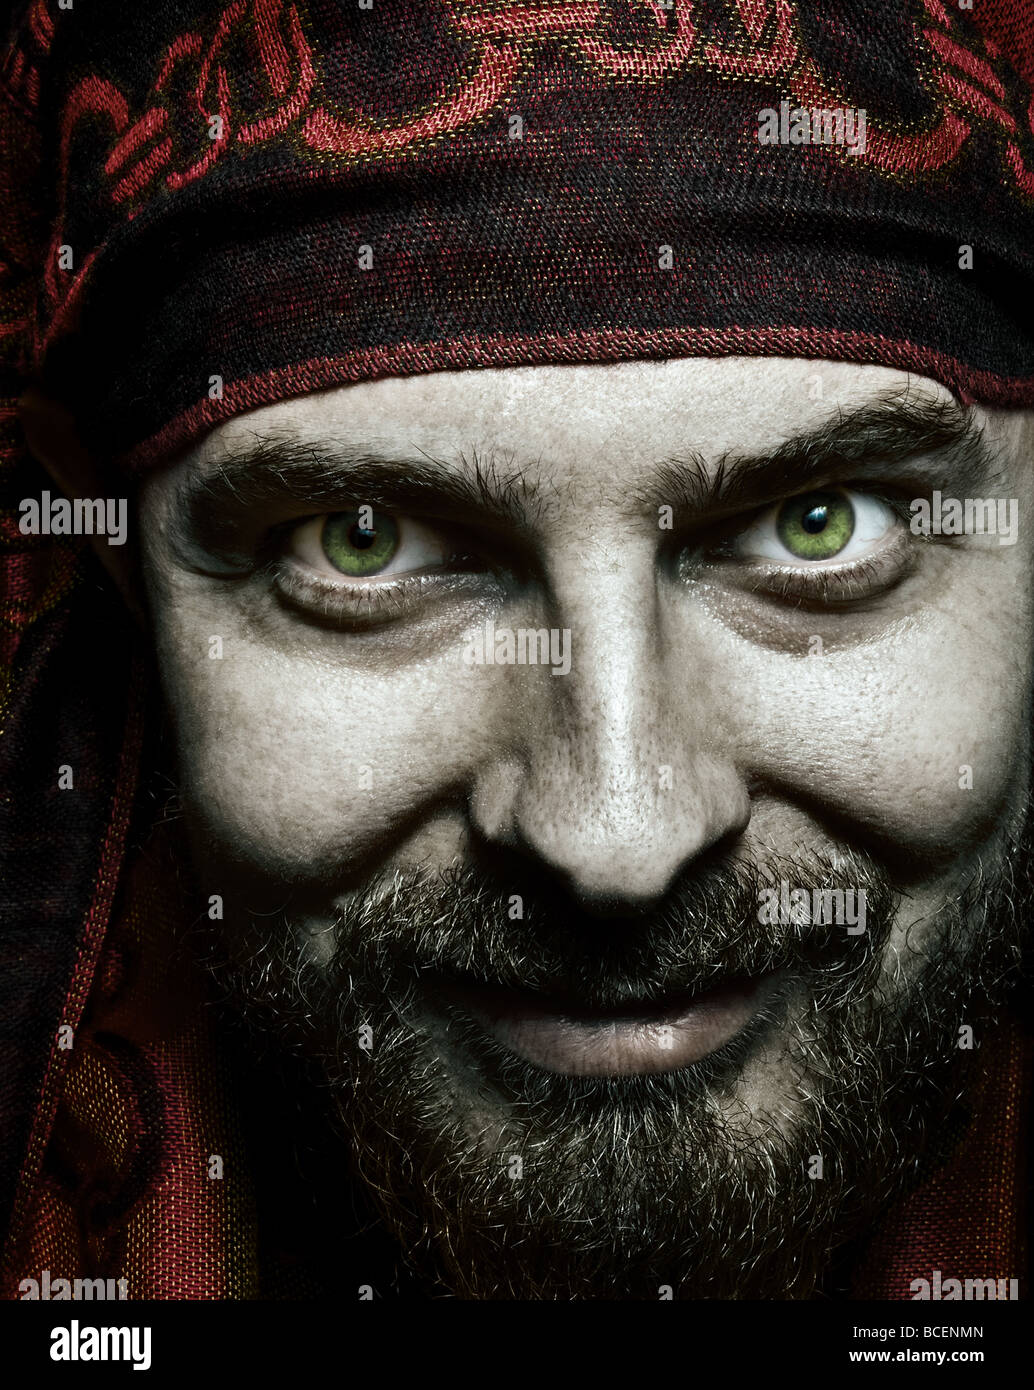 Close up portrait of funny bizzare spooky man - Stock Image